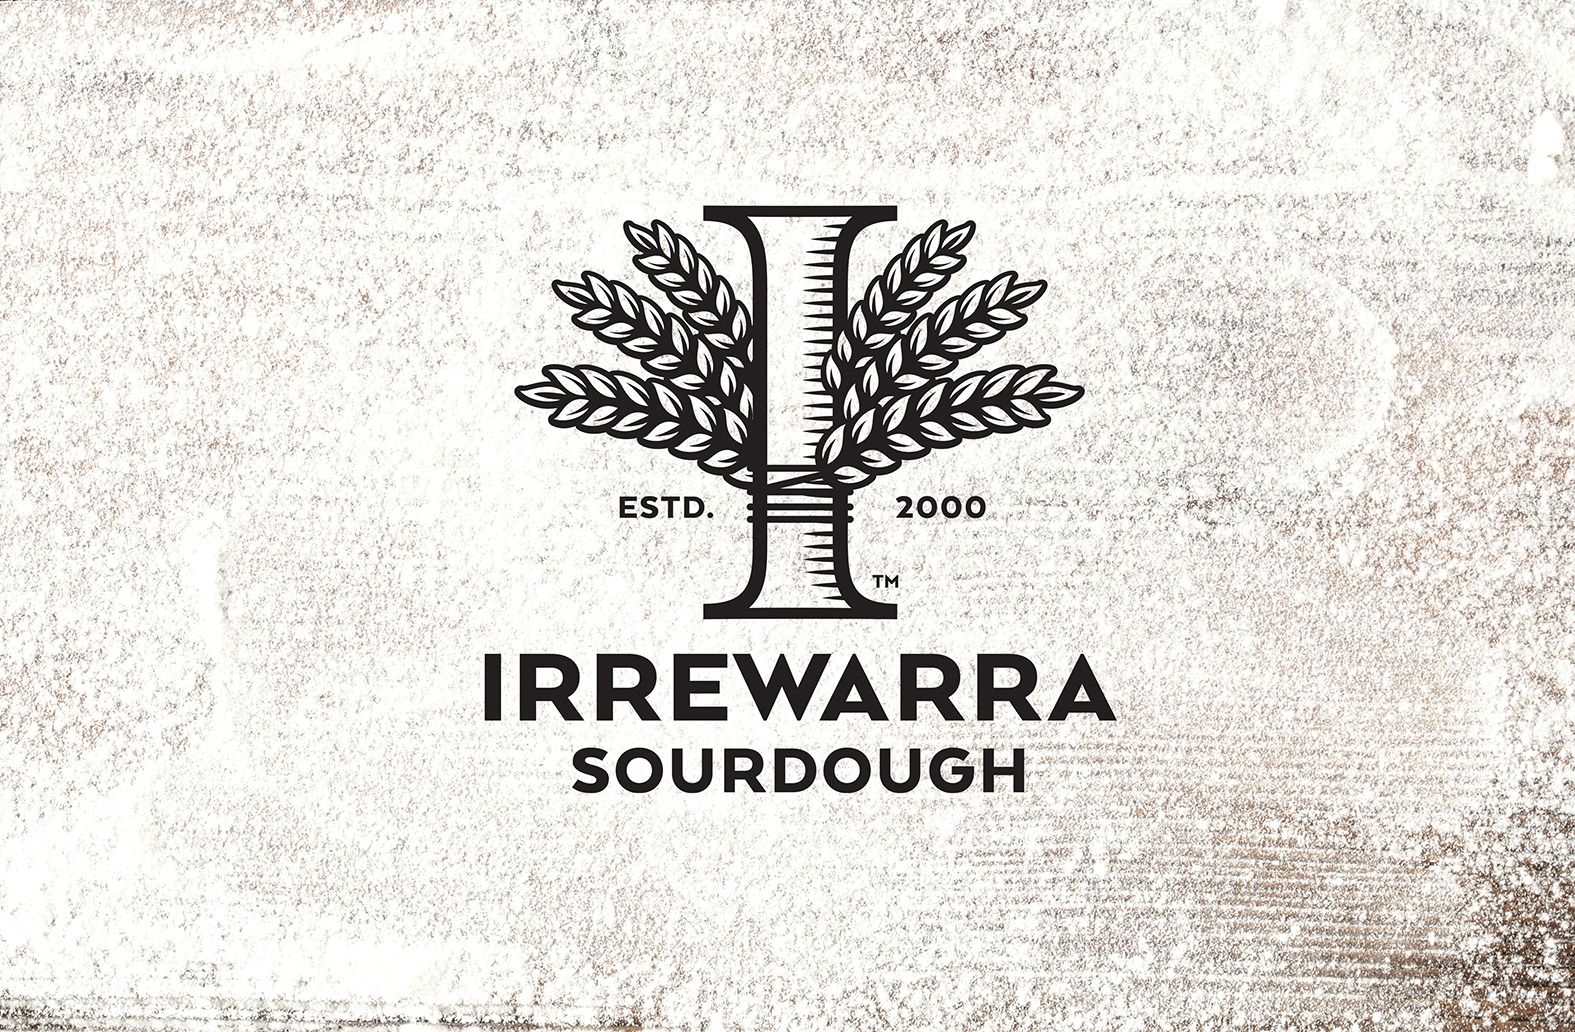 IrrewarraHero.jpg